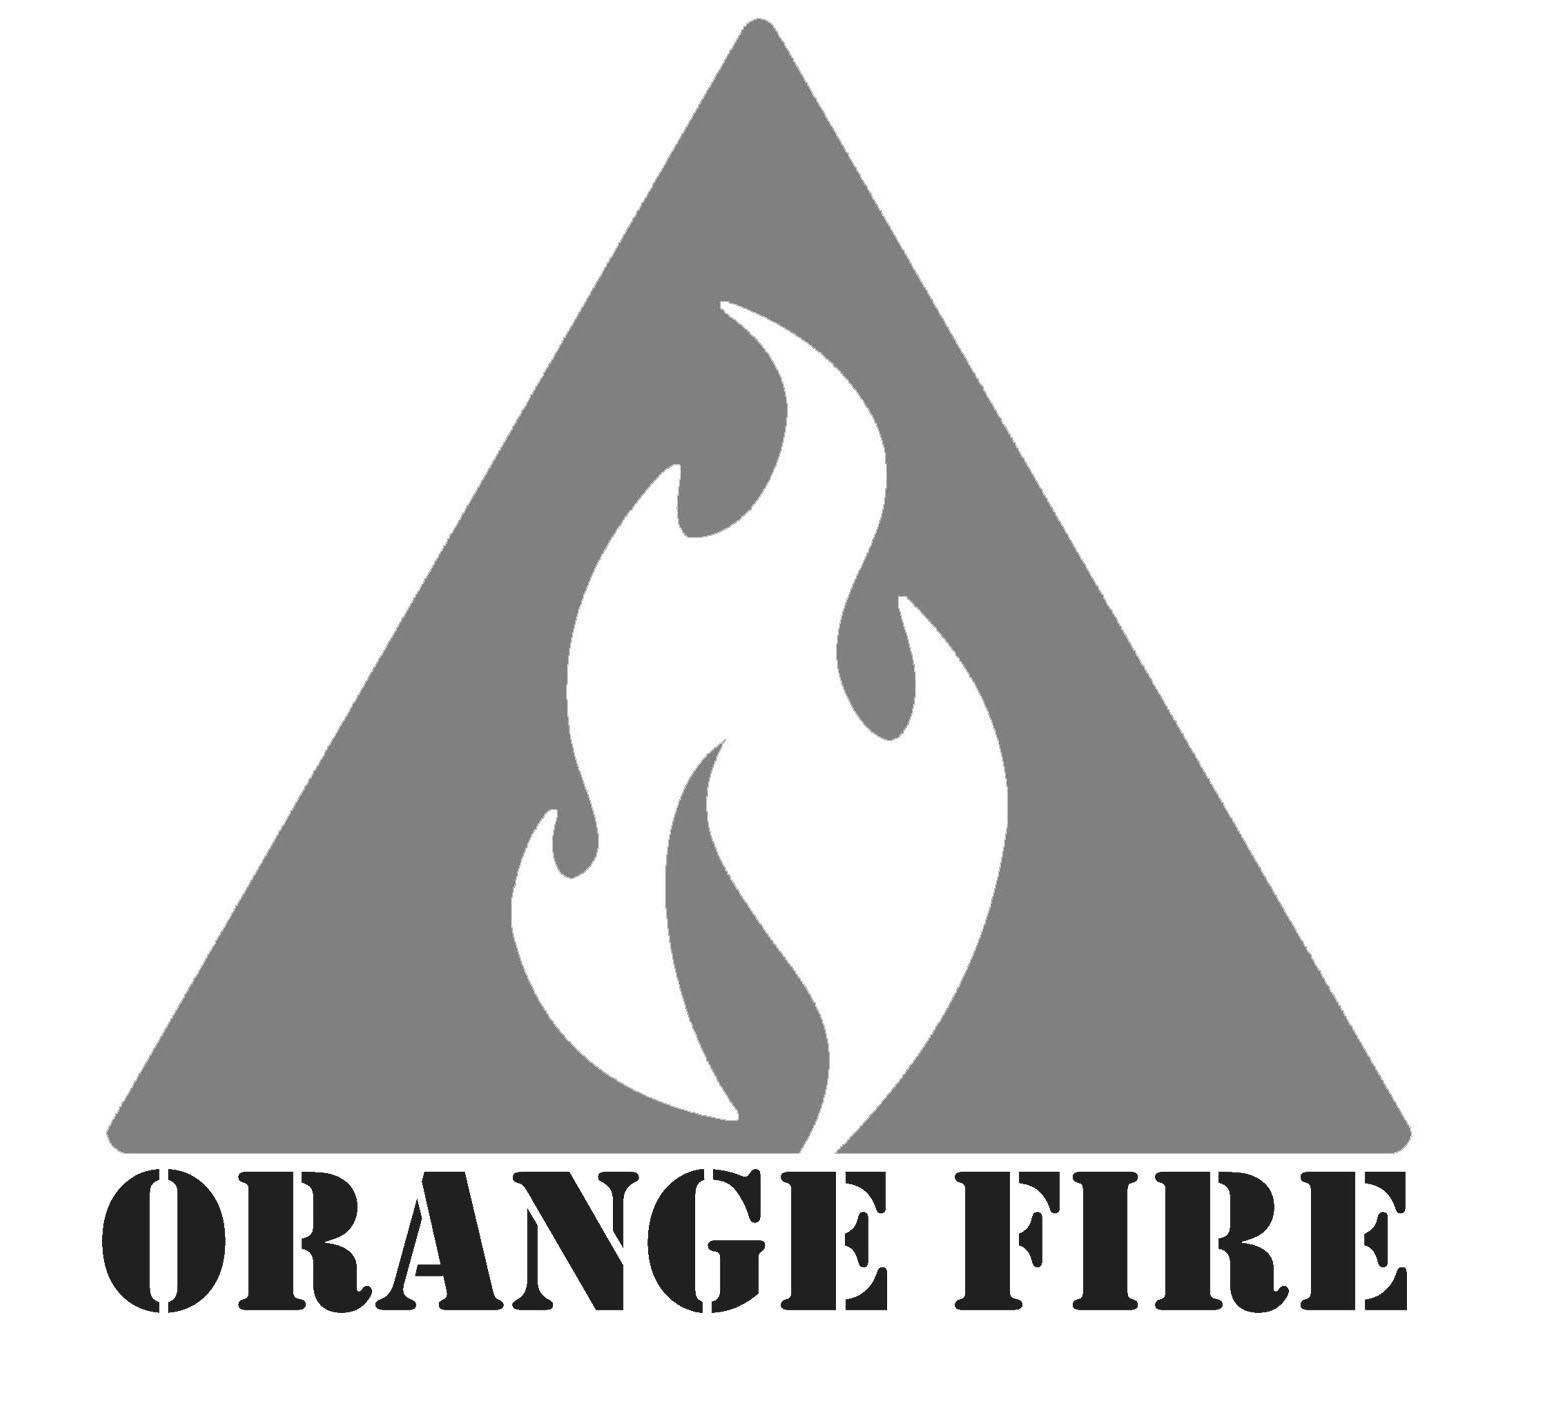 Logo Orangefire.jpg